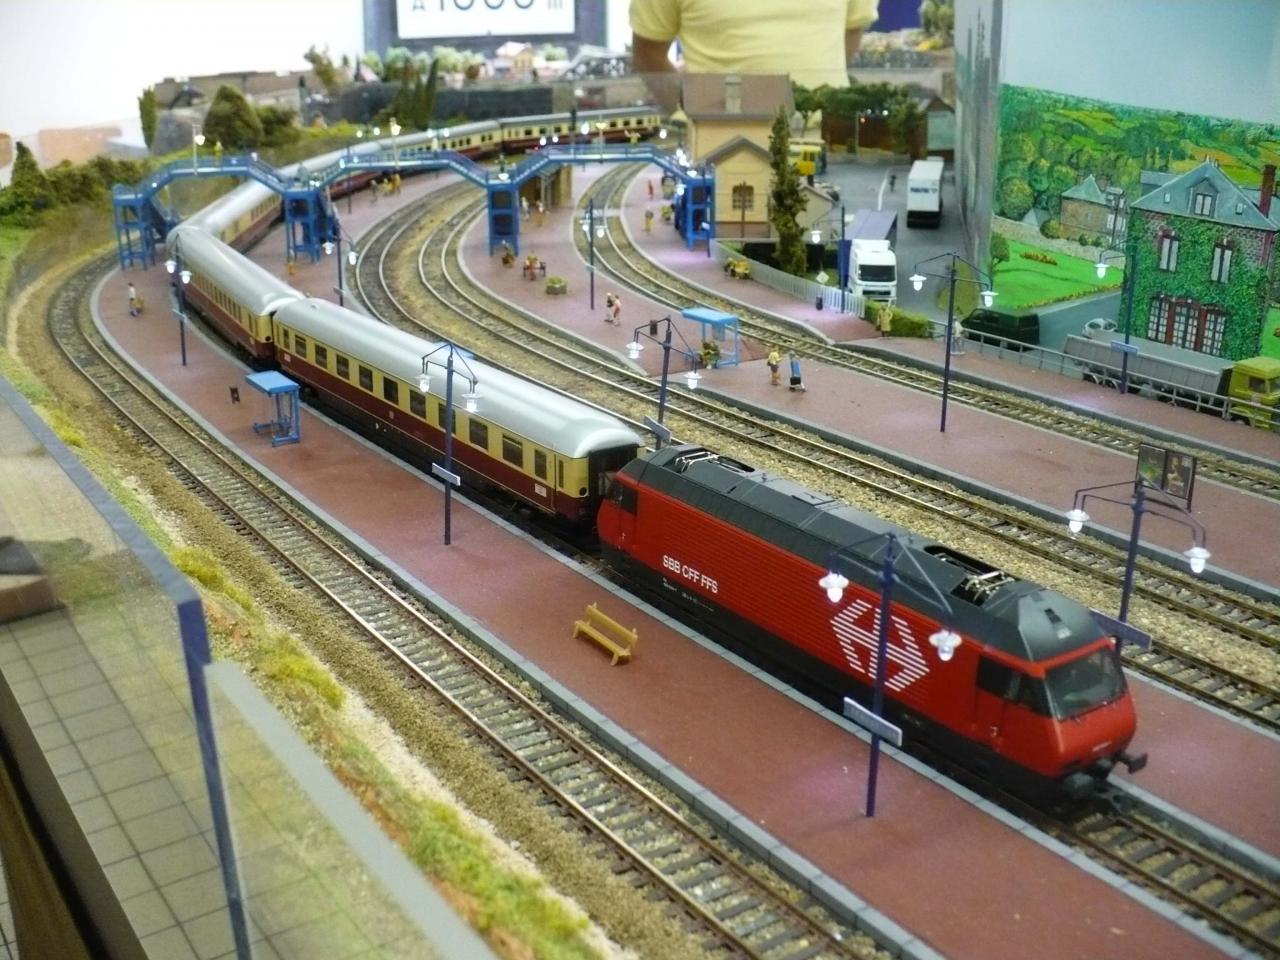 Rame voyageurs allemande et loco suisse